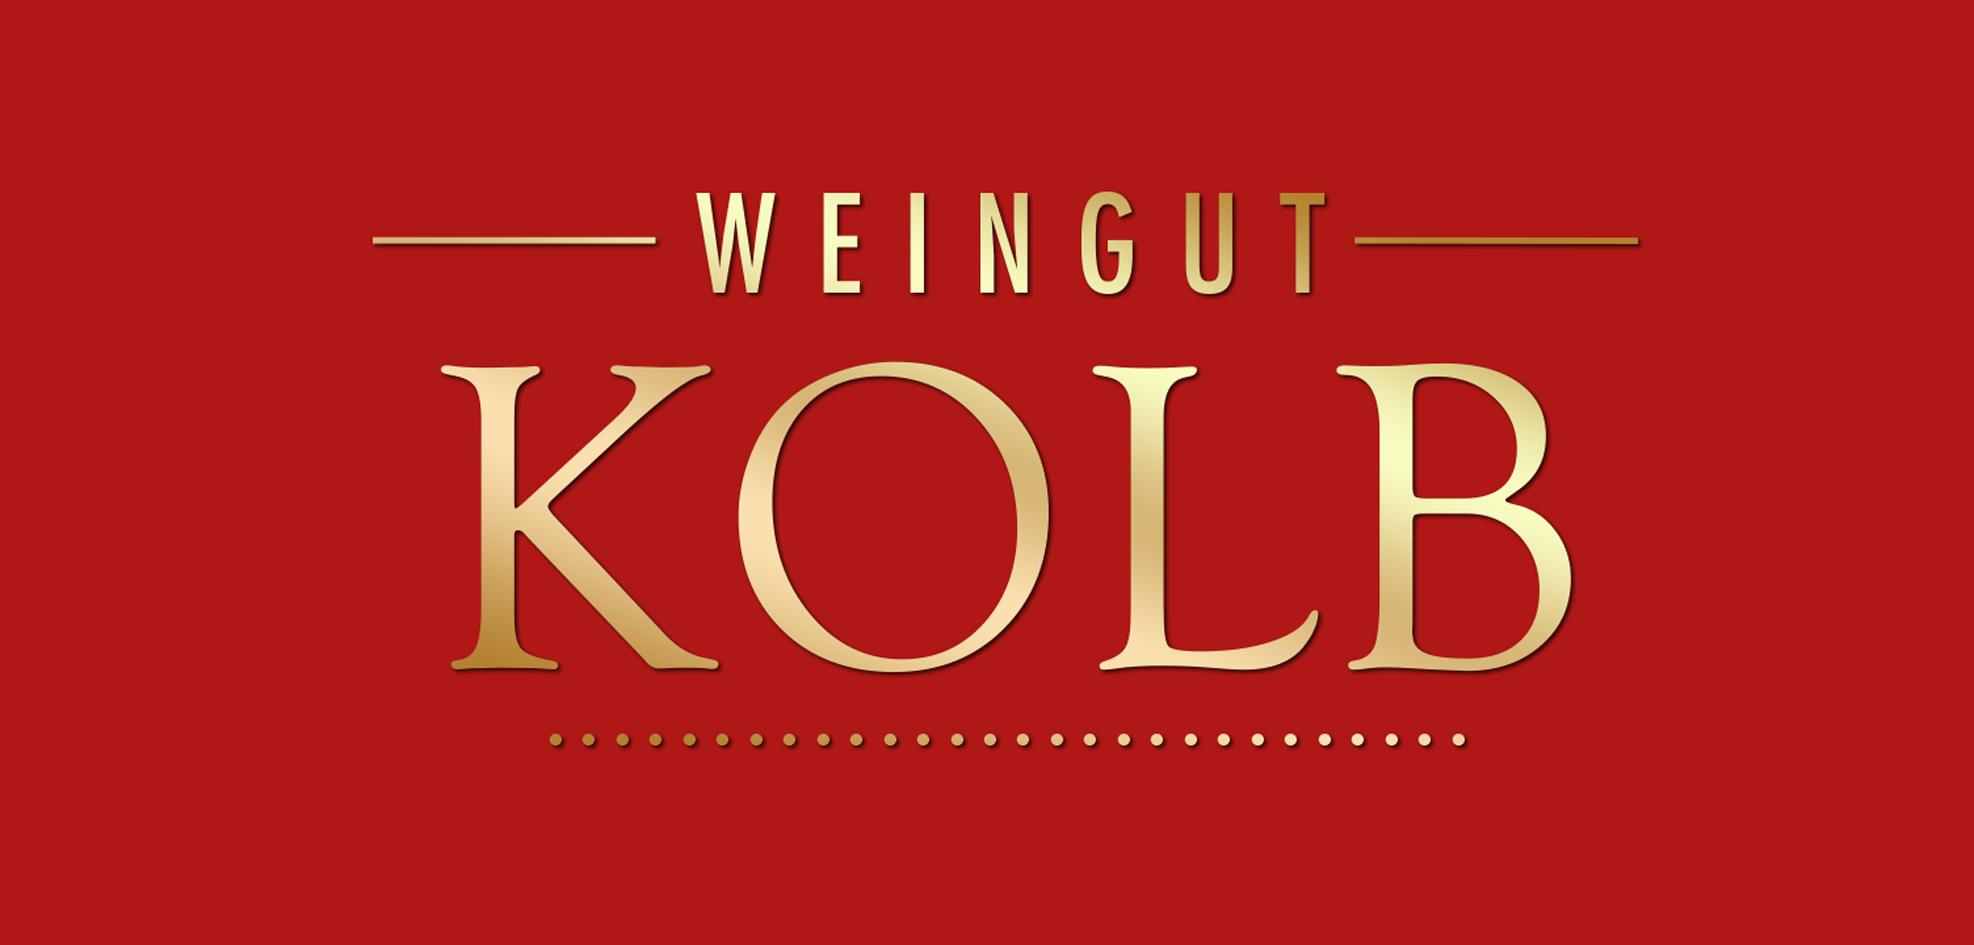 Onlineshop Weingut Kolb